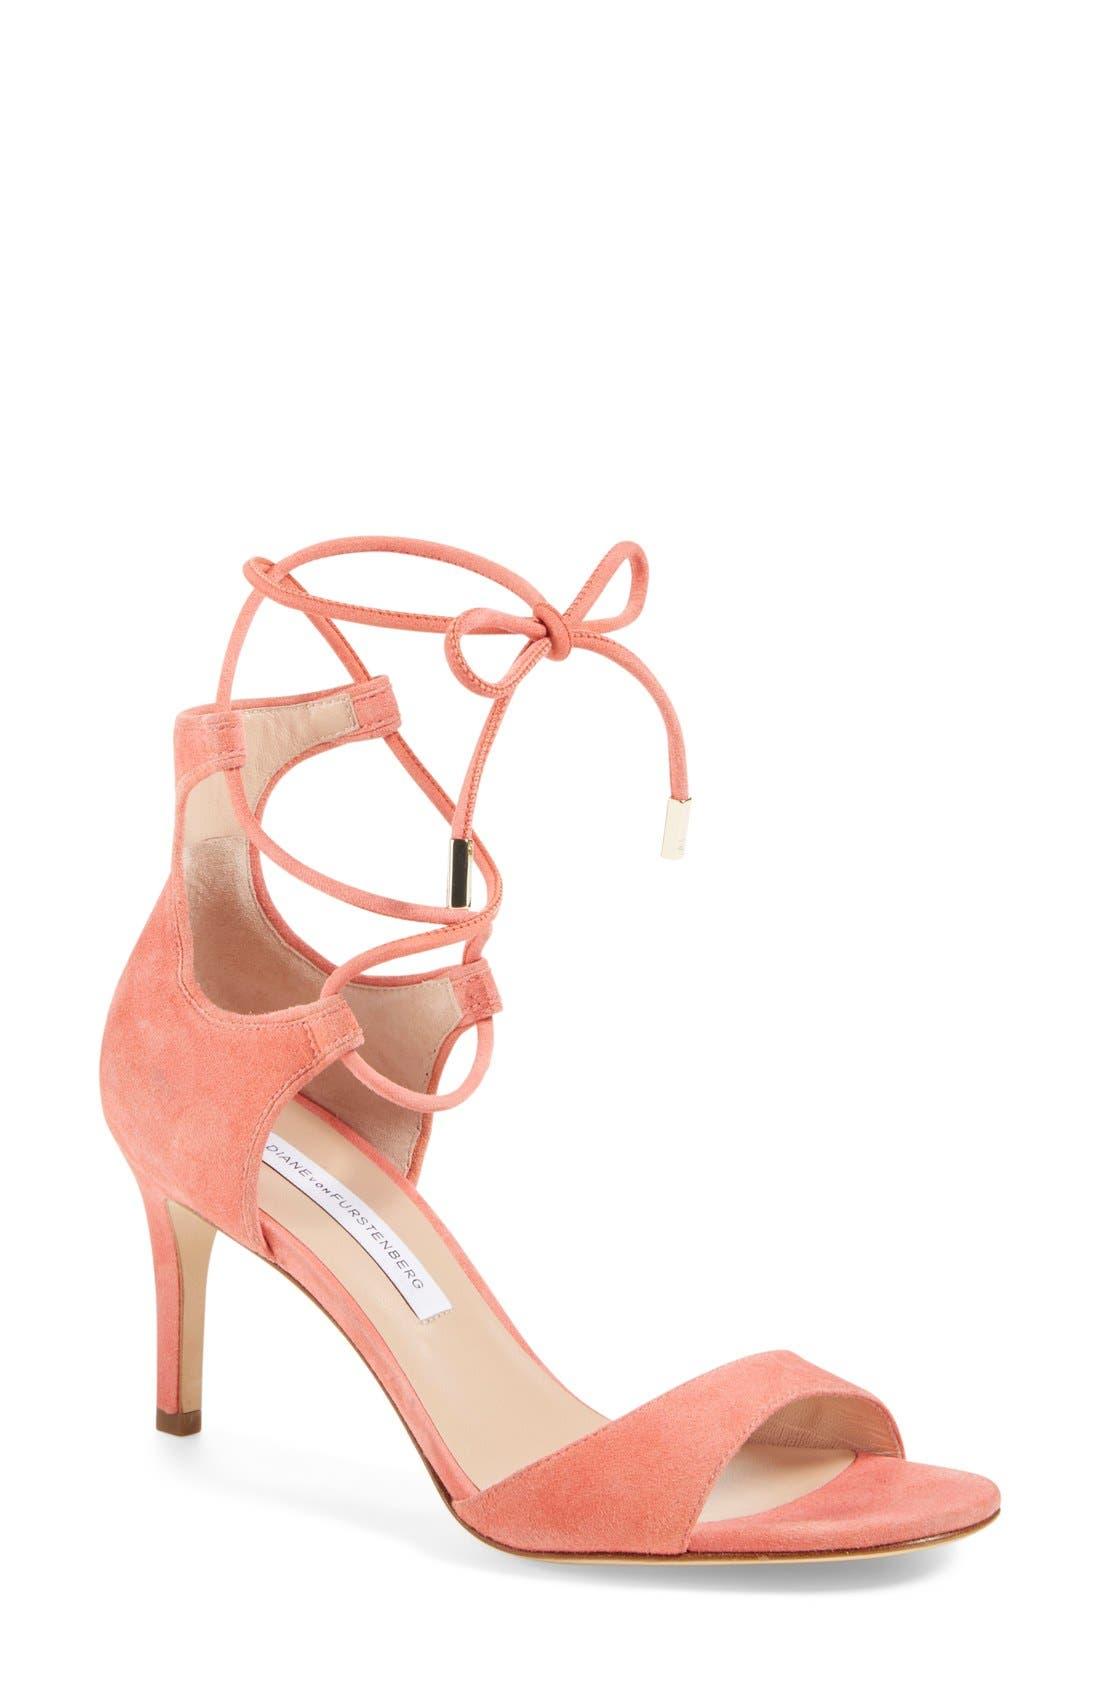 Alternate Image 1 Selected - Diane von Furstenberg 'Rimini' Ankle Wrap Sandal (Women)